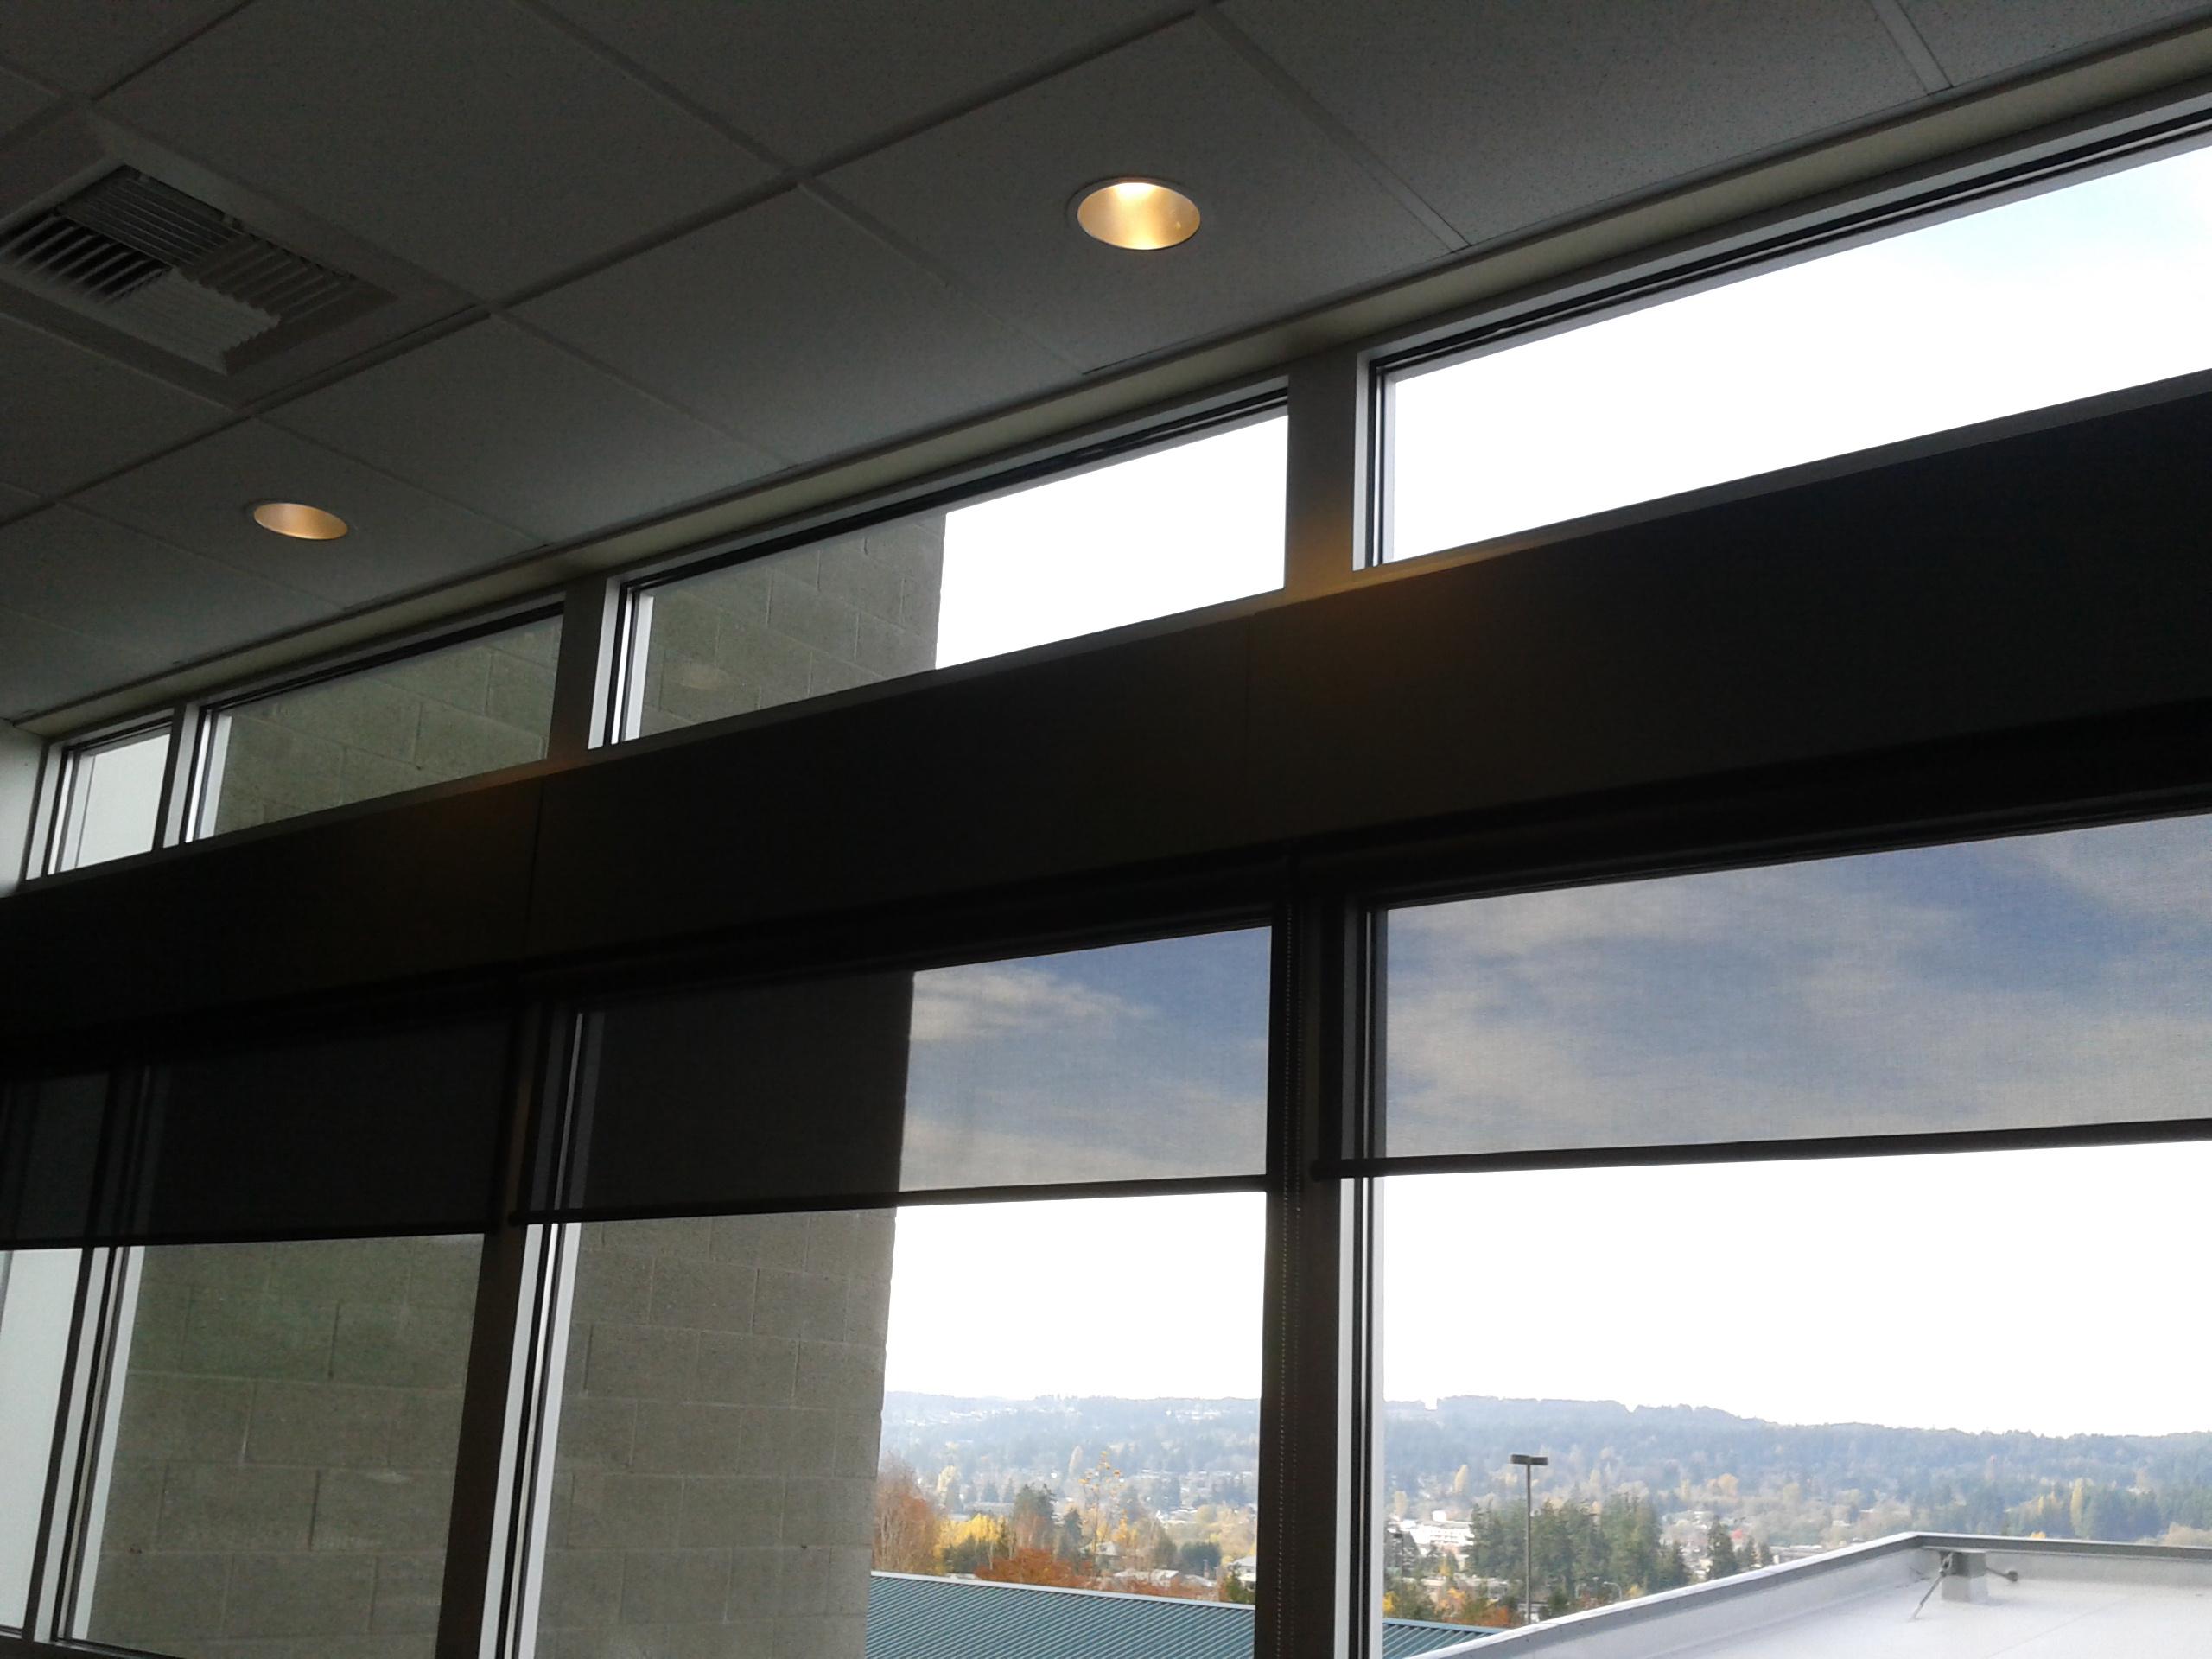 Exterior sun shades for windows - Image